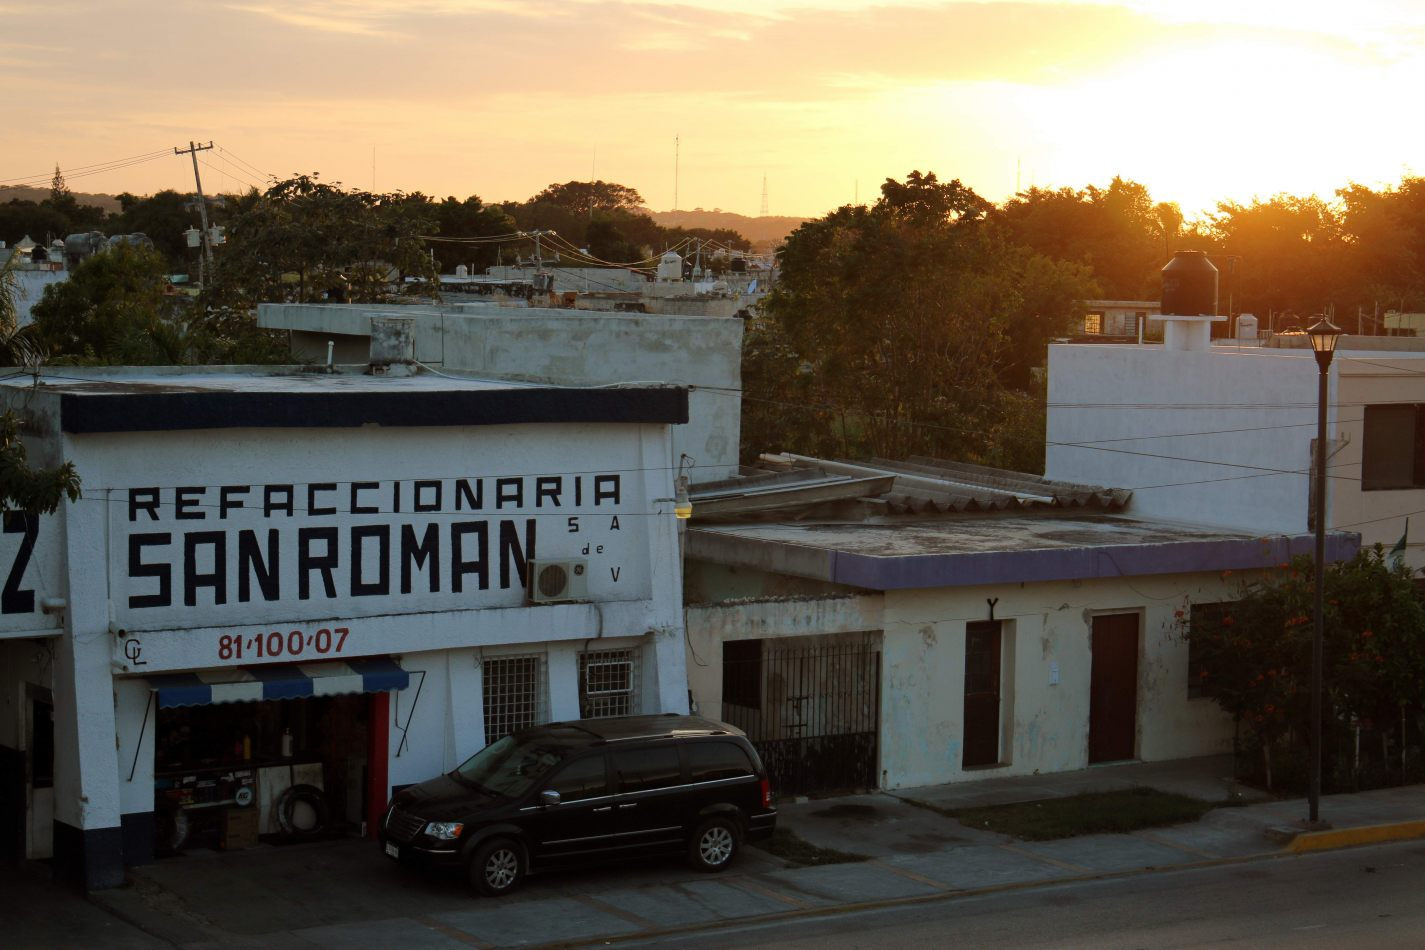 Anthony Ellis Photography: Small Sacrifices - San Roman Sunset